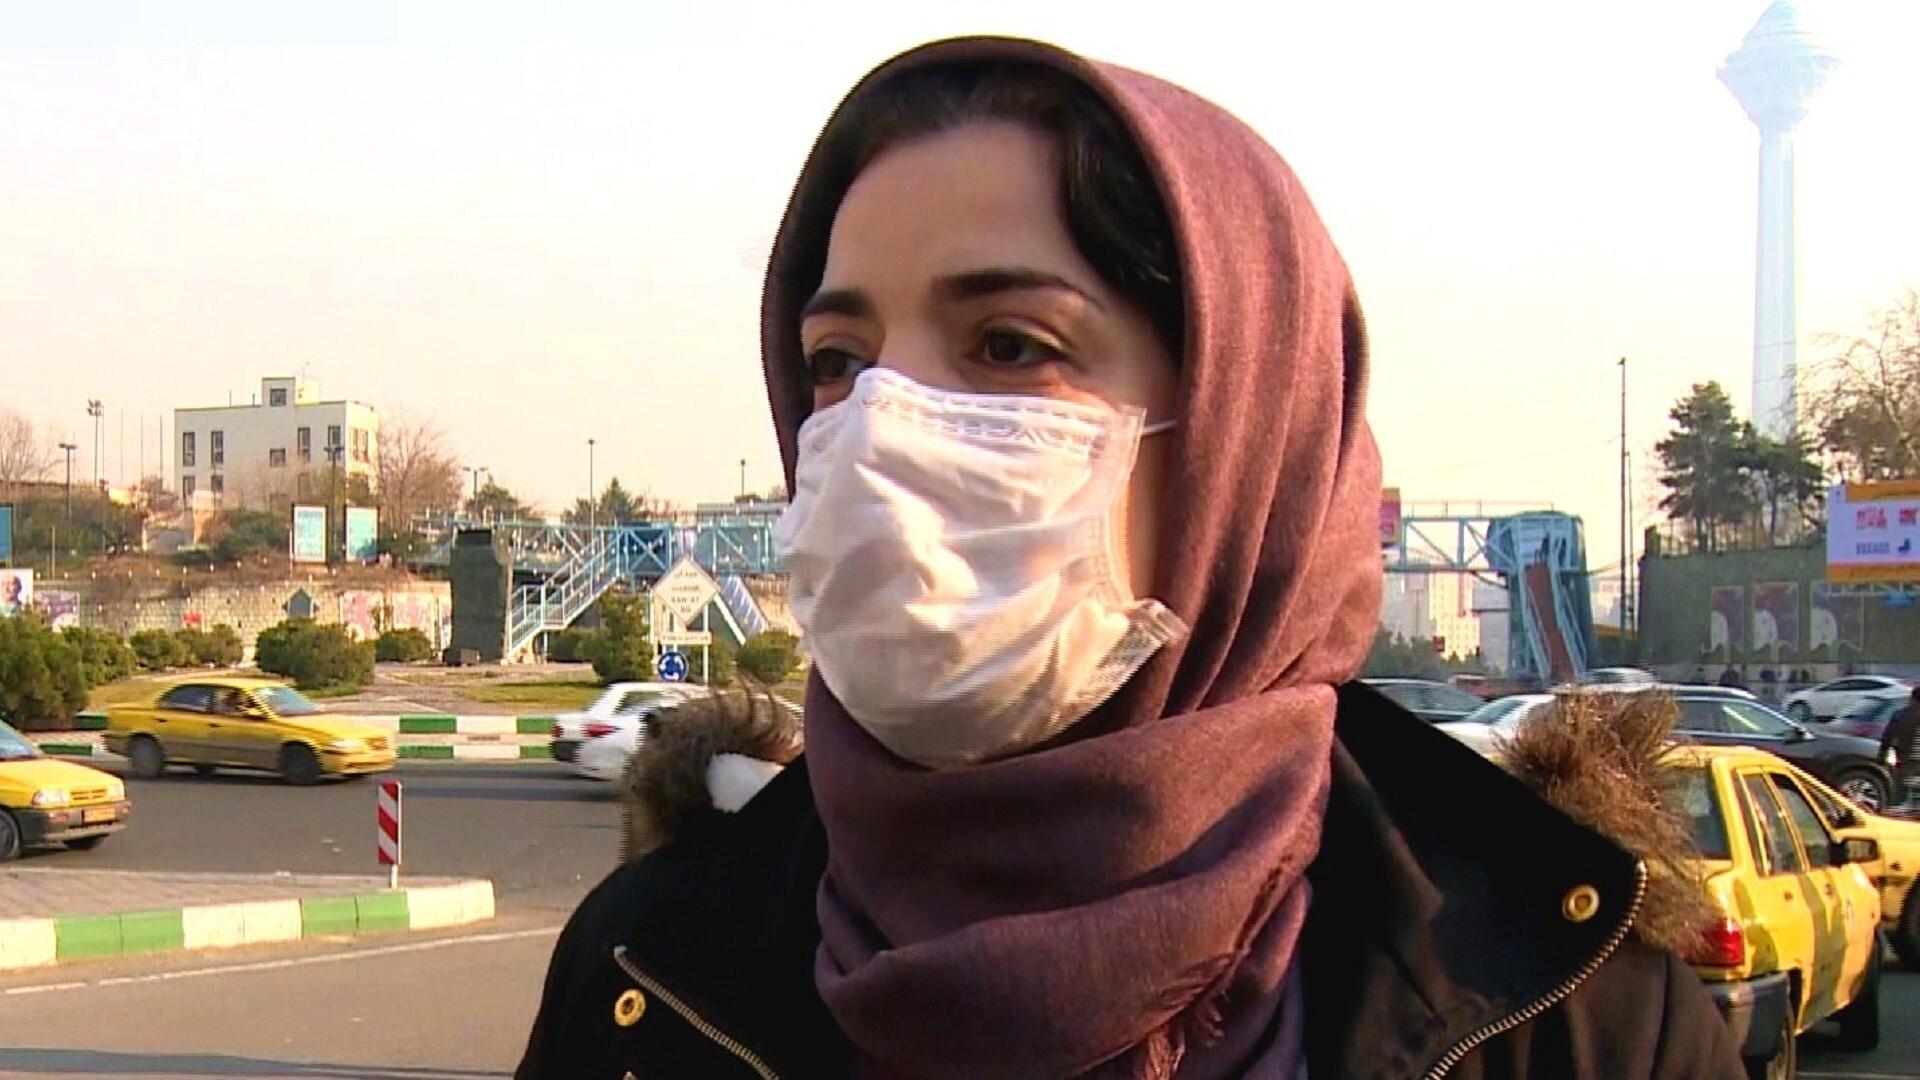 Iran's air pollution: Schools shut, children kept indoors